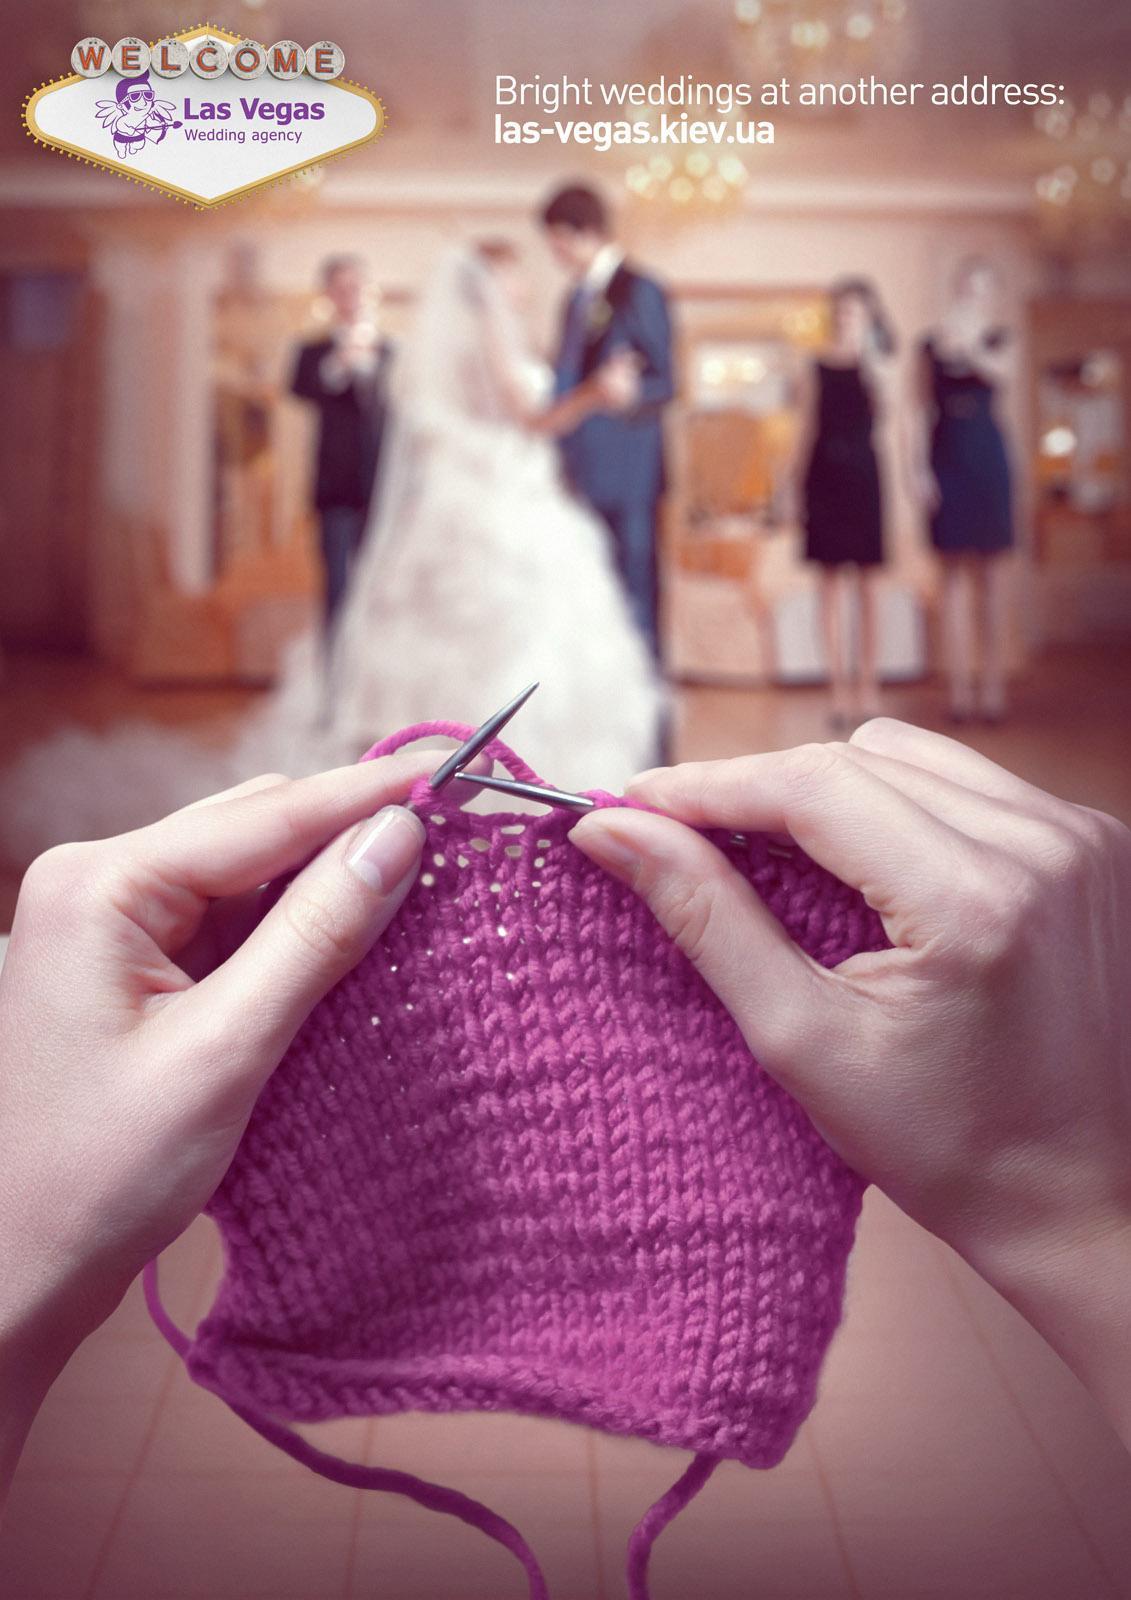 Las Vegas Wedding Agency Print Ad -  Knitting